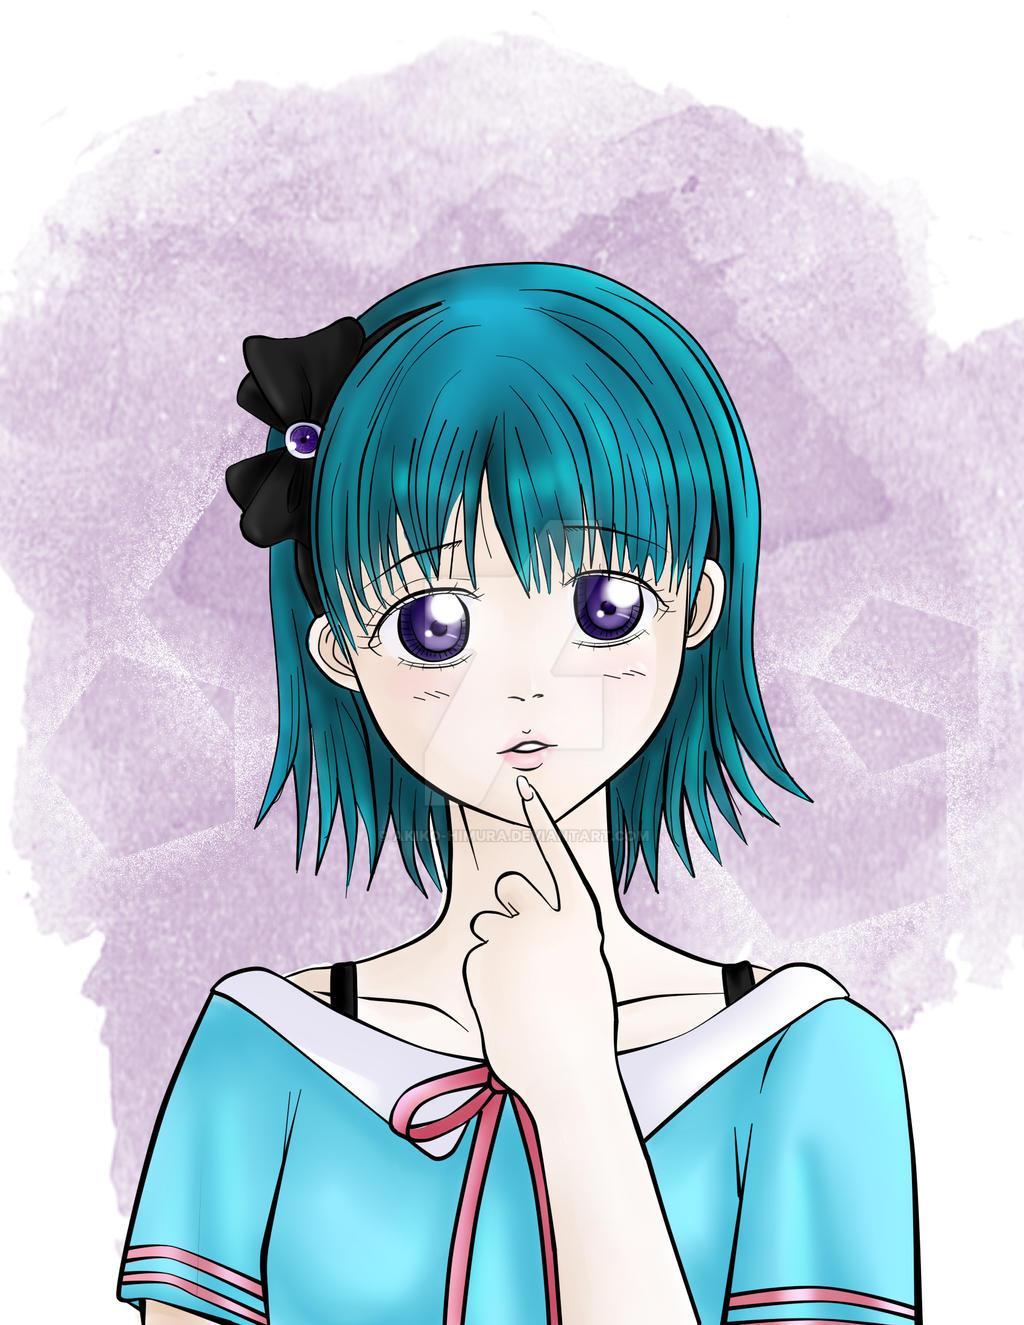 Kawaii Girl by Akiko-Himura